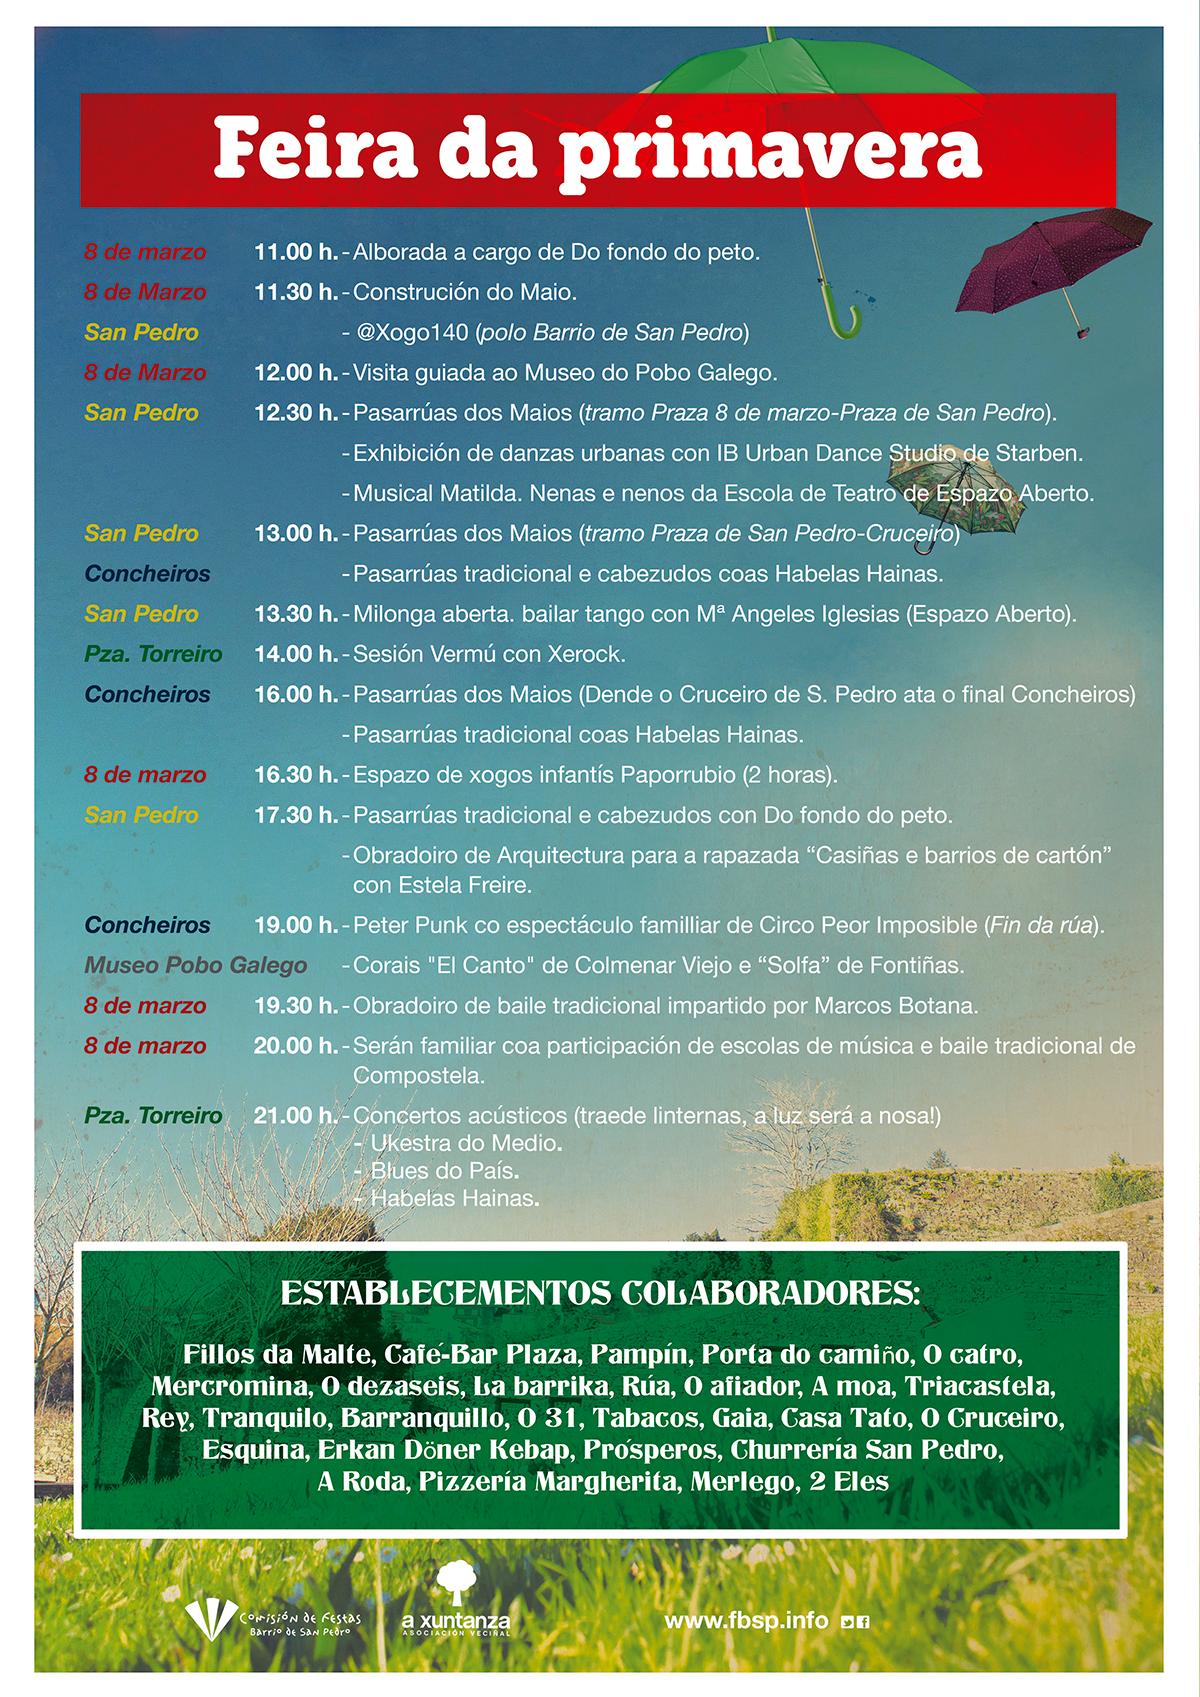 Programa Feira da Primavera 2015